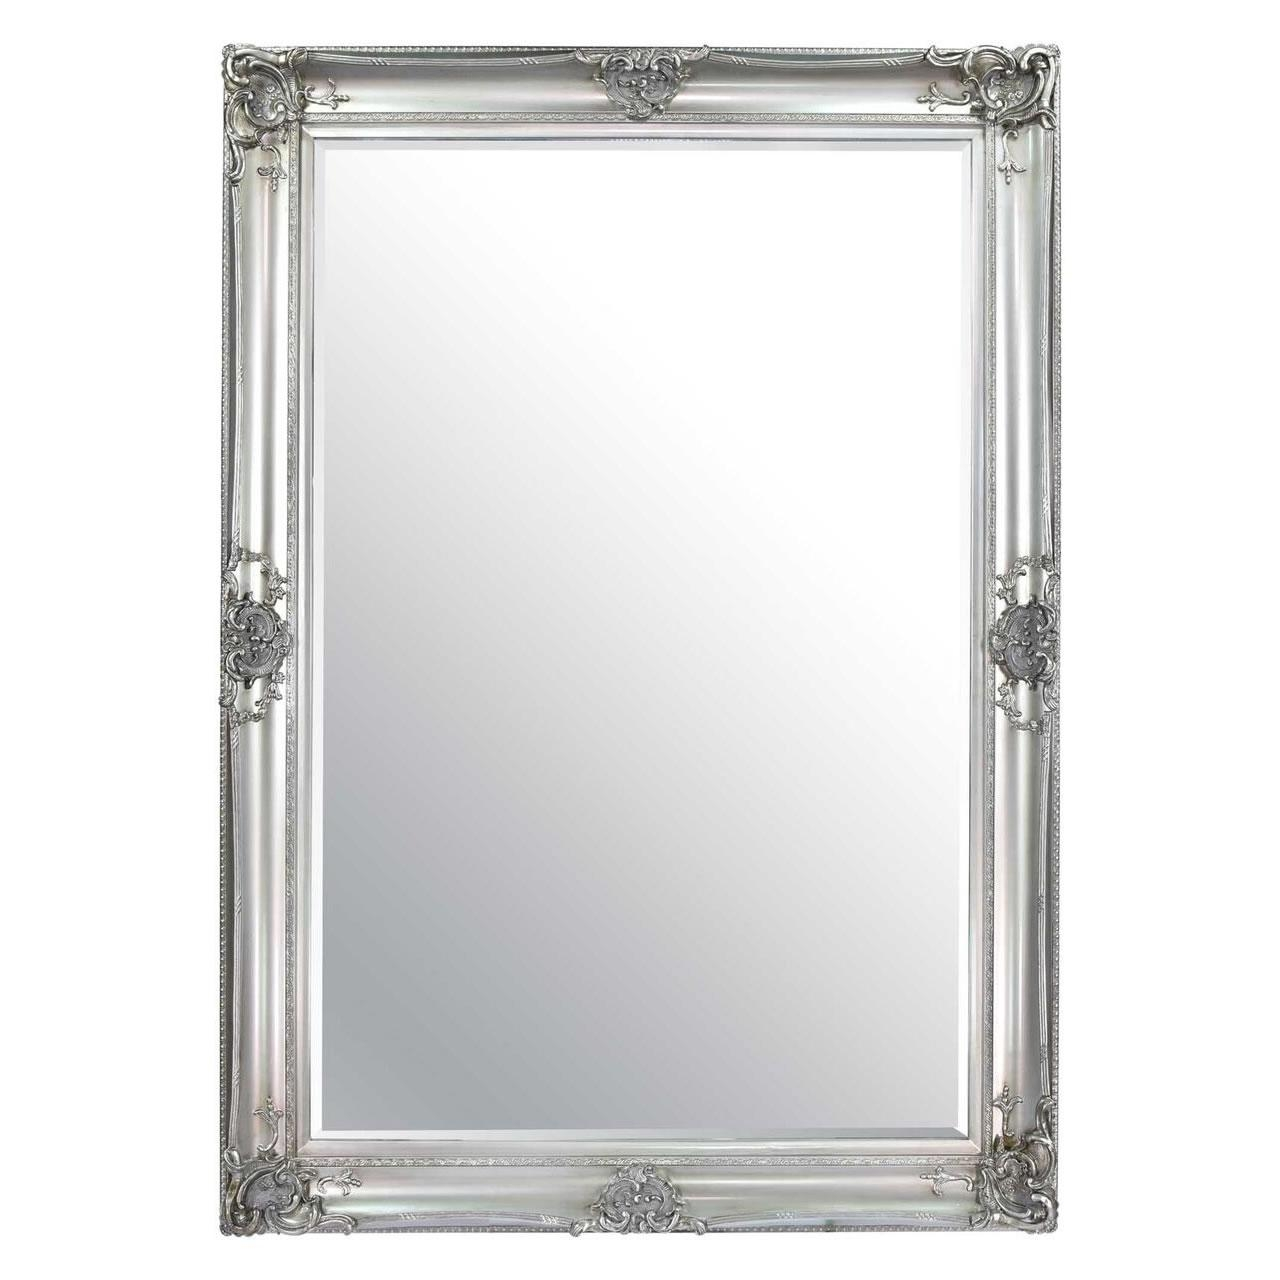 Ornate Framed Mirrors Inside Mirrors Ornate (Image 11 of 20)